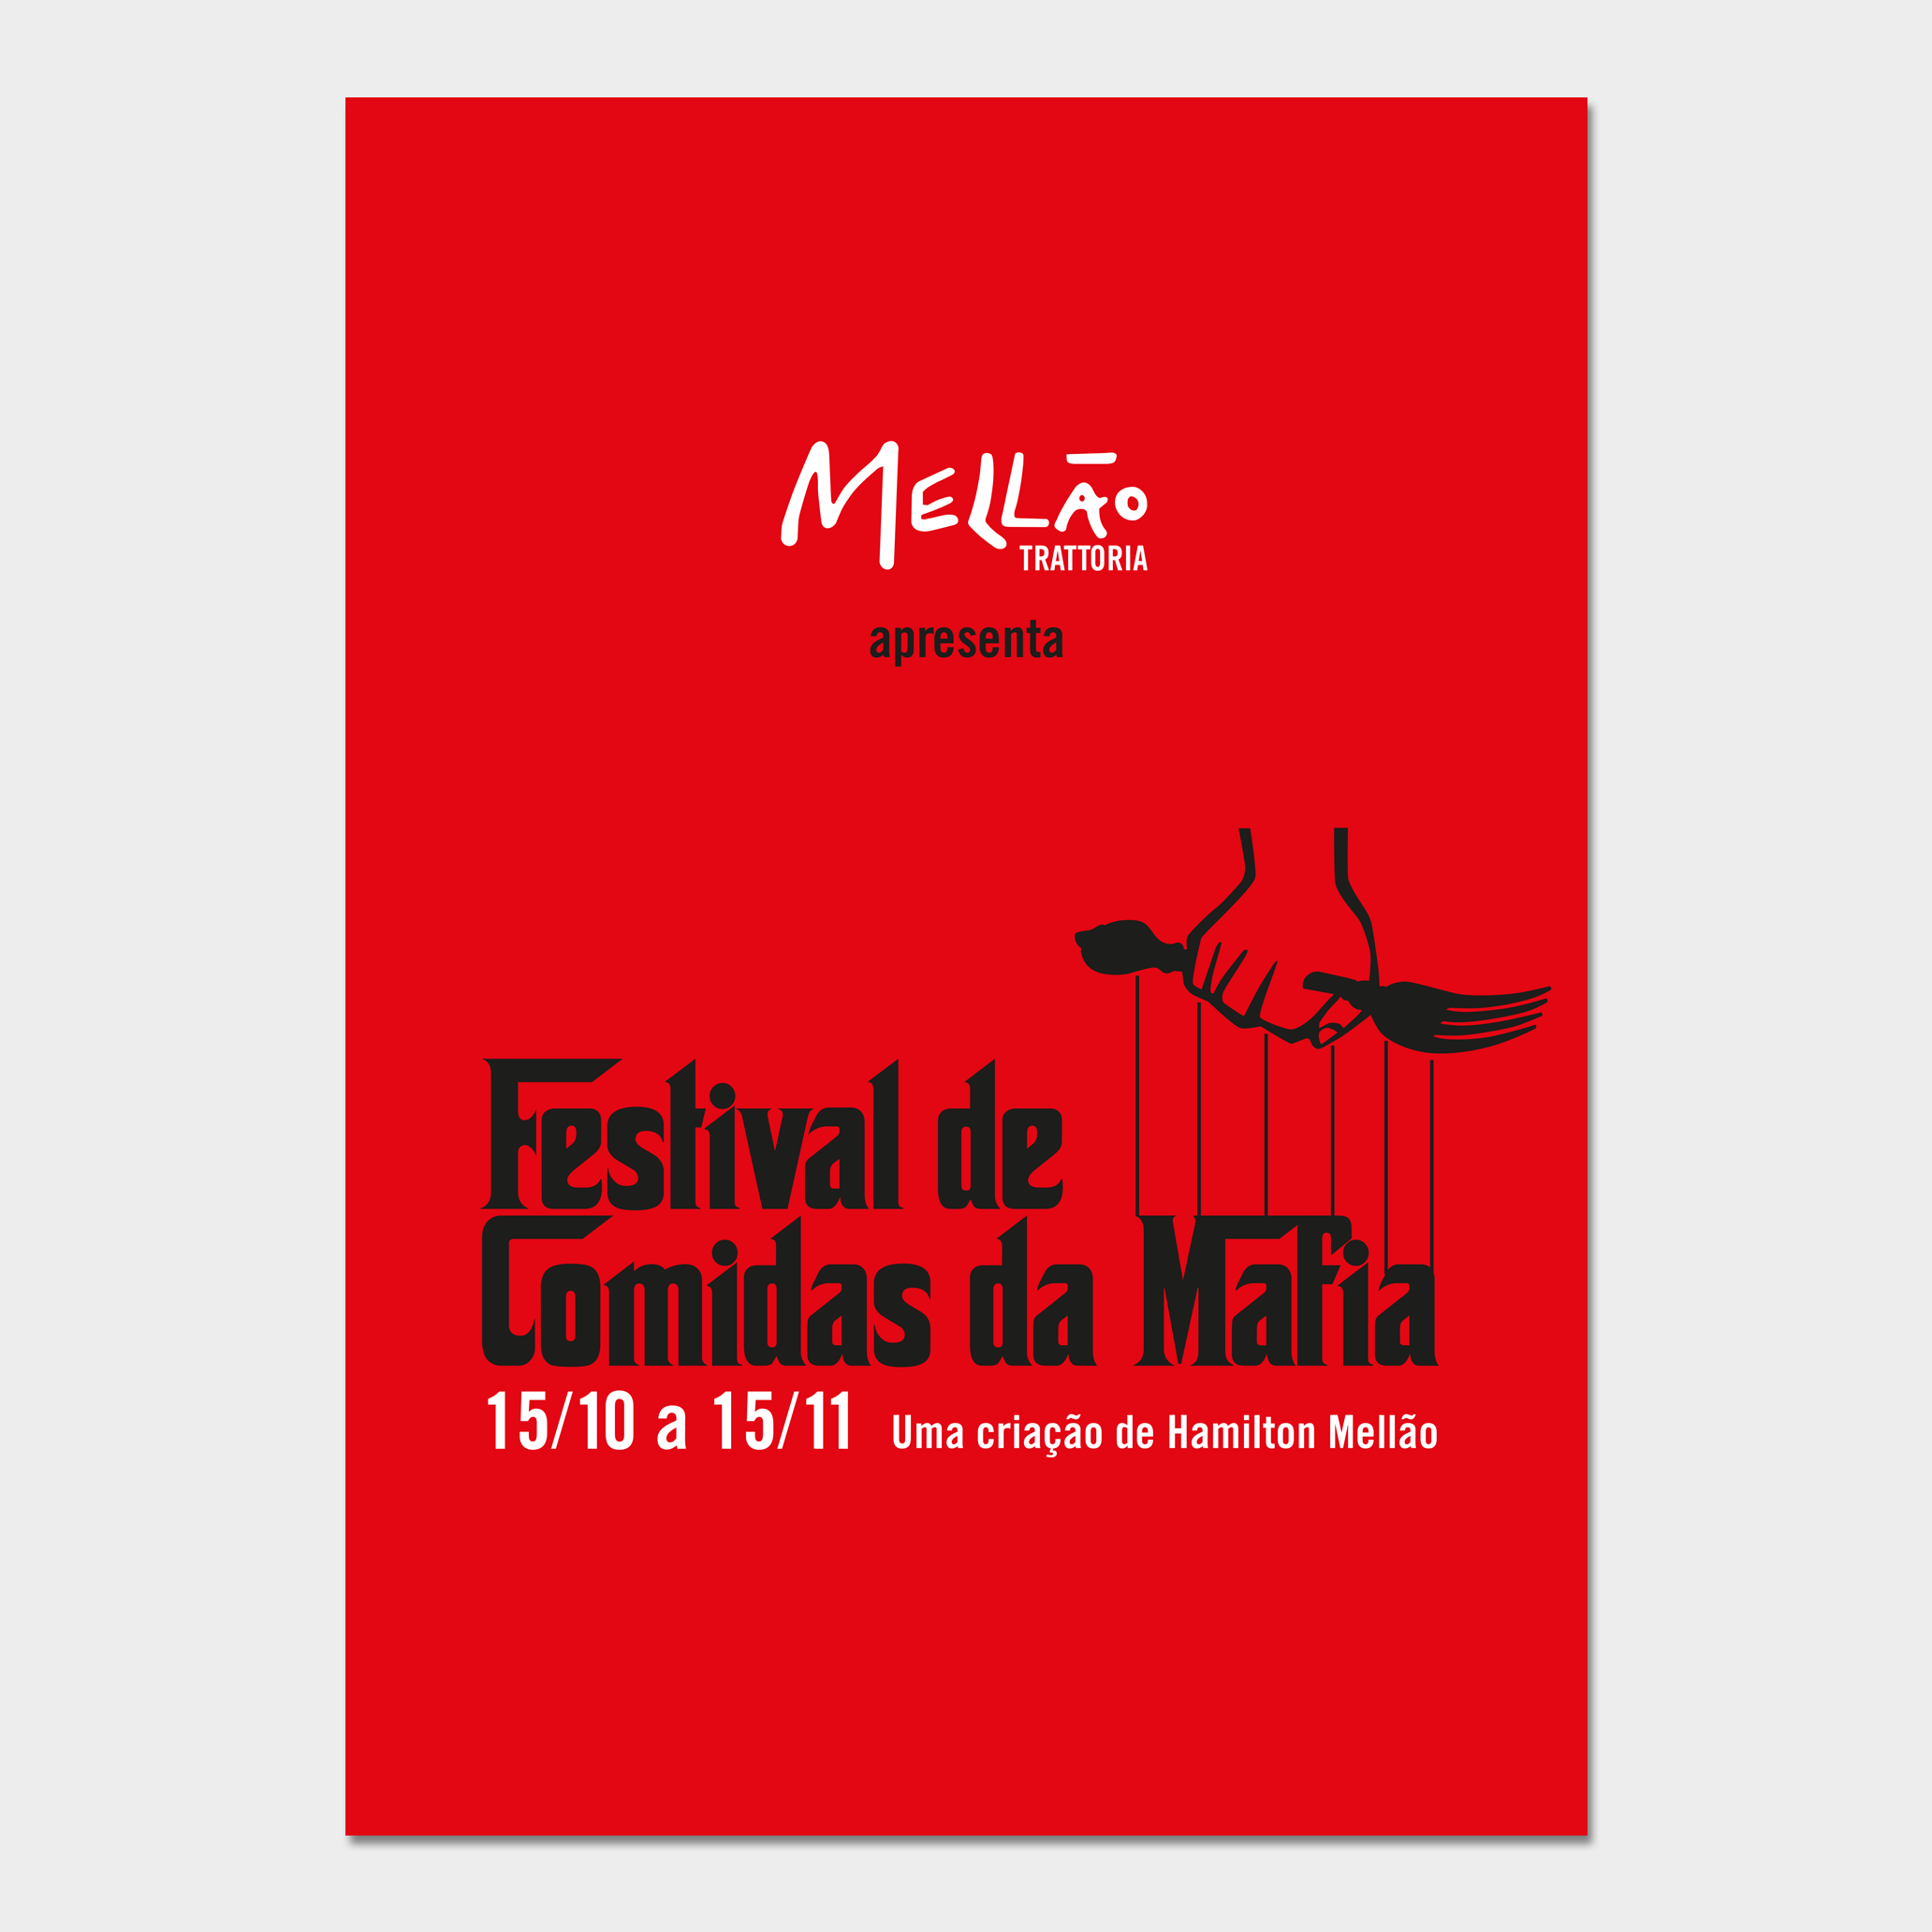 Banner para o Festival da Máfia.